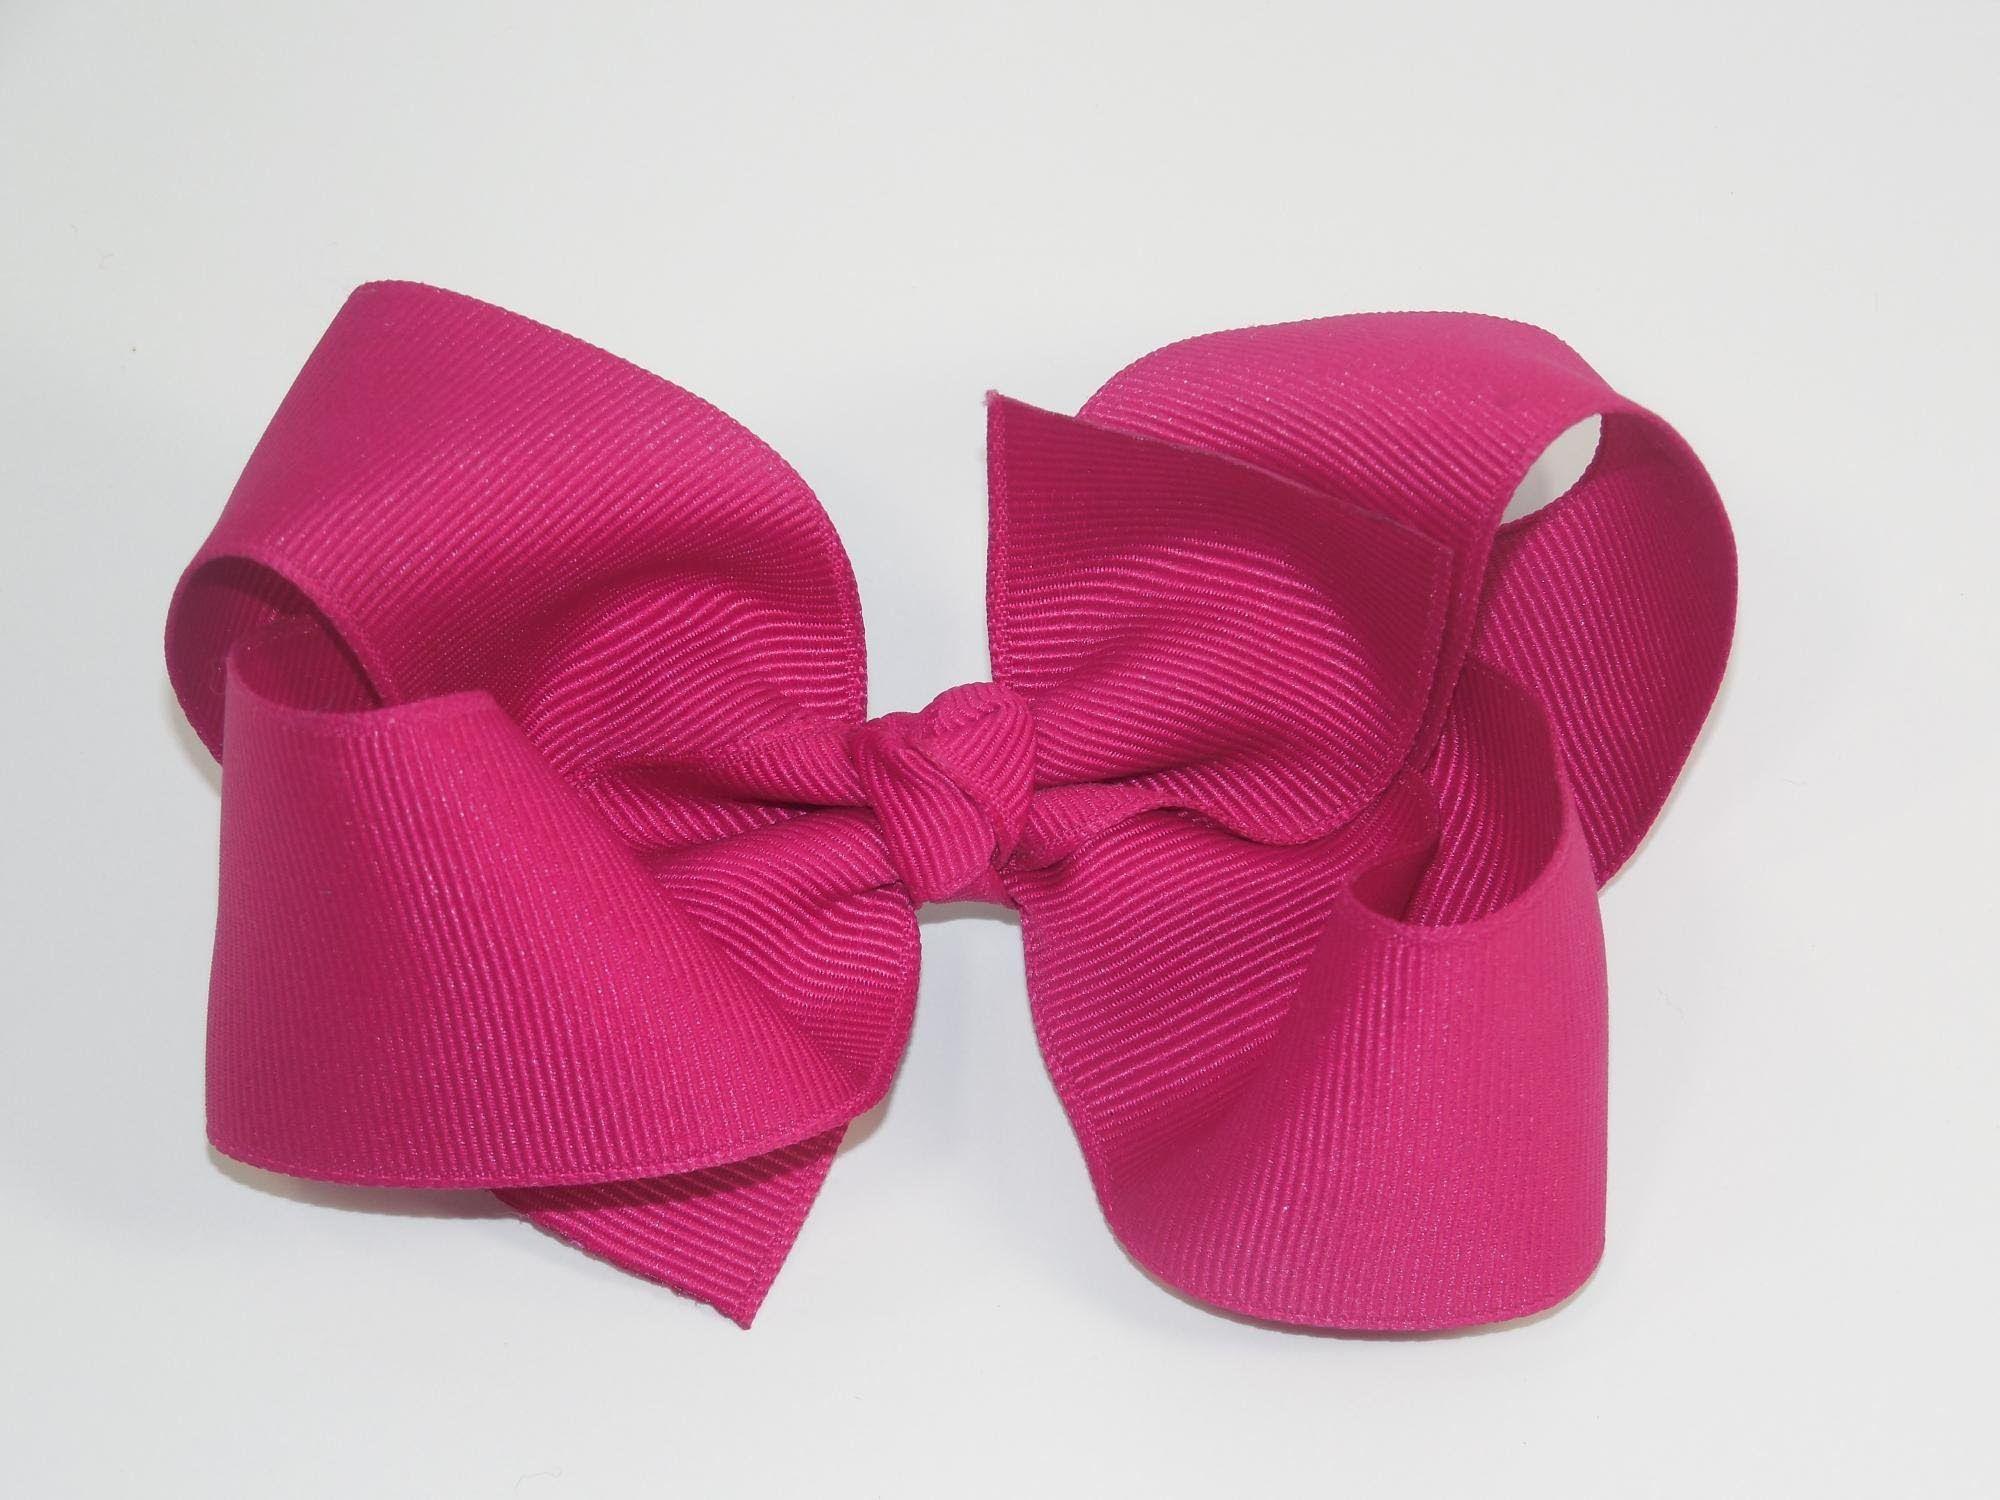 Ha hair bow ribbon wholesale - How To Make A Big Girl Boutique Hair Bow